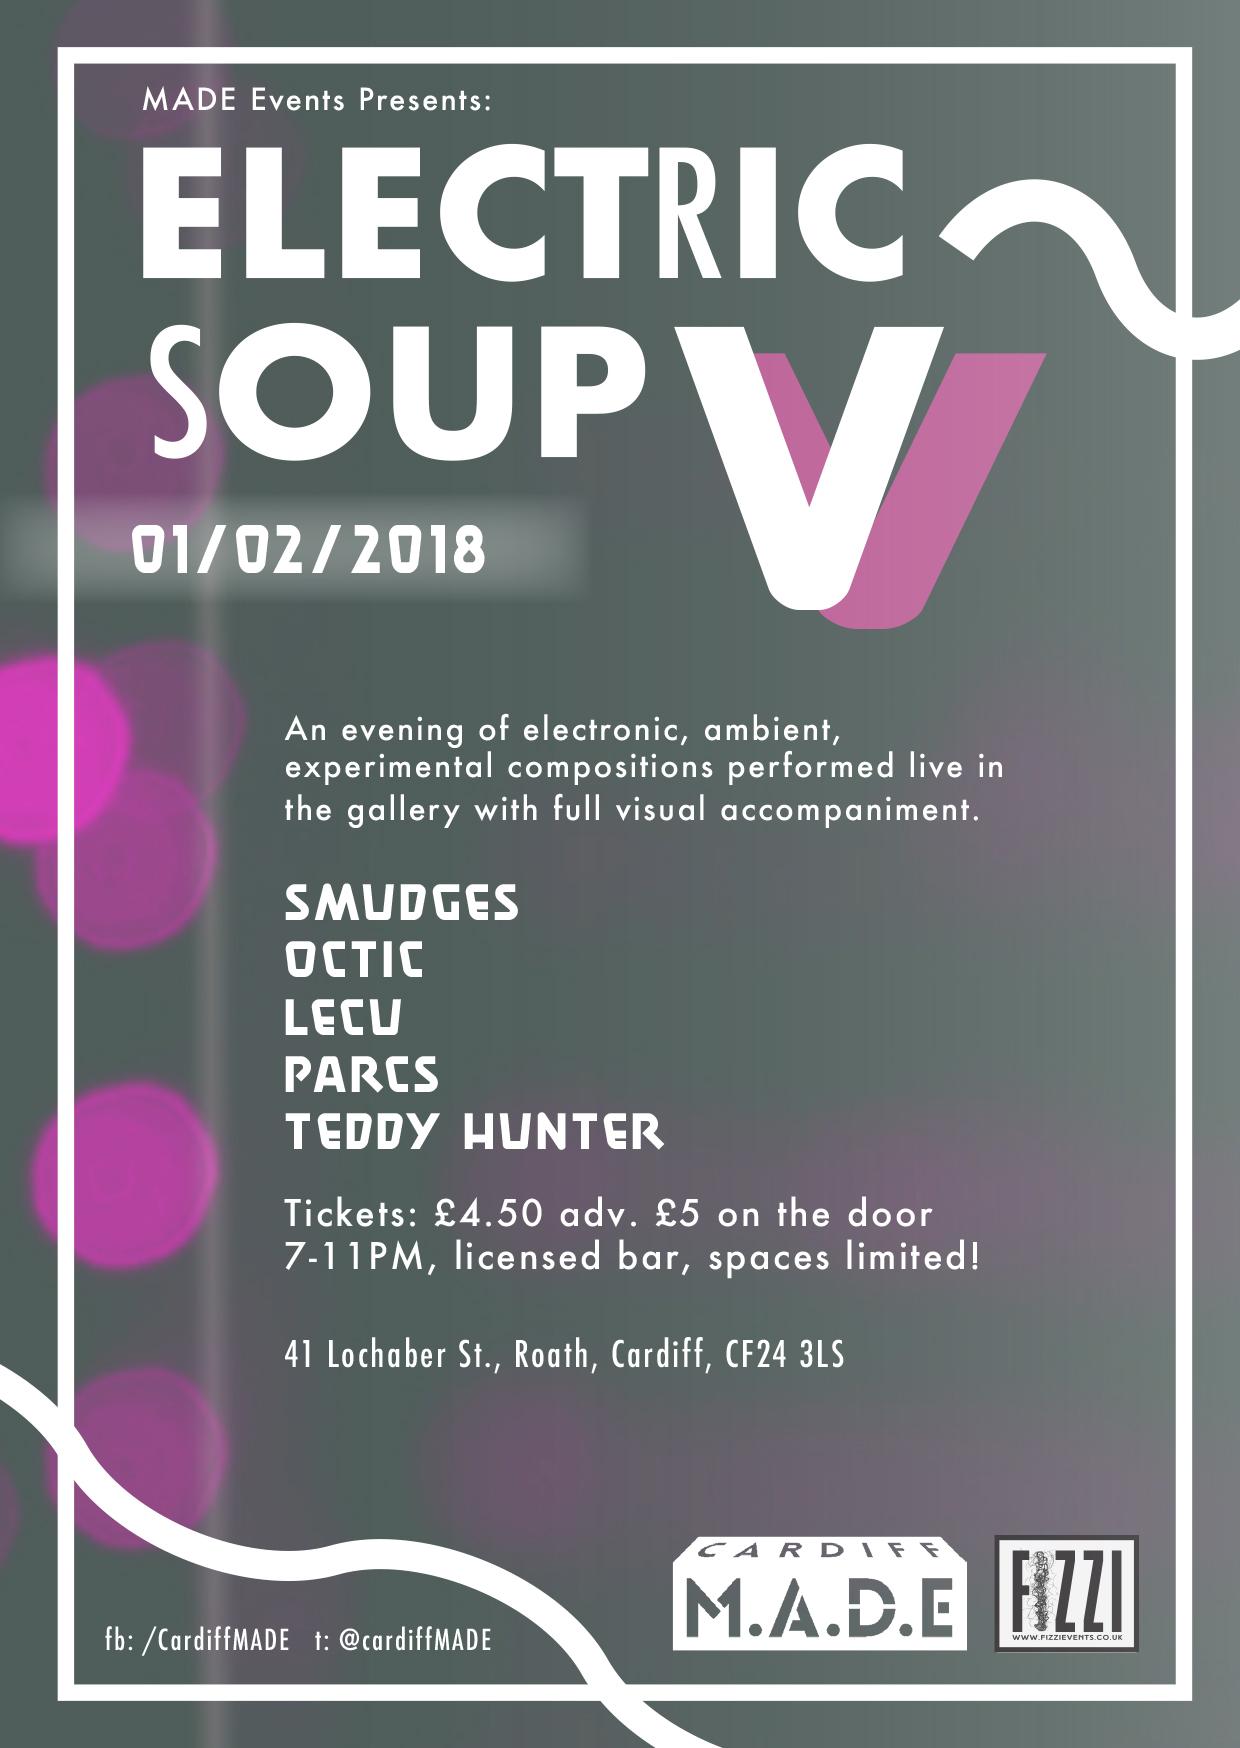 Electric Soup V – Cardiff M.A.D.E